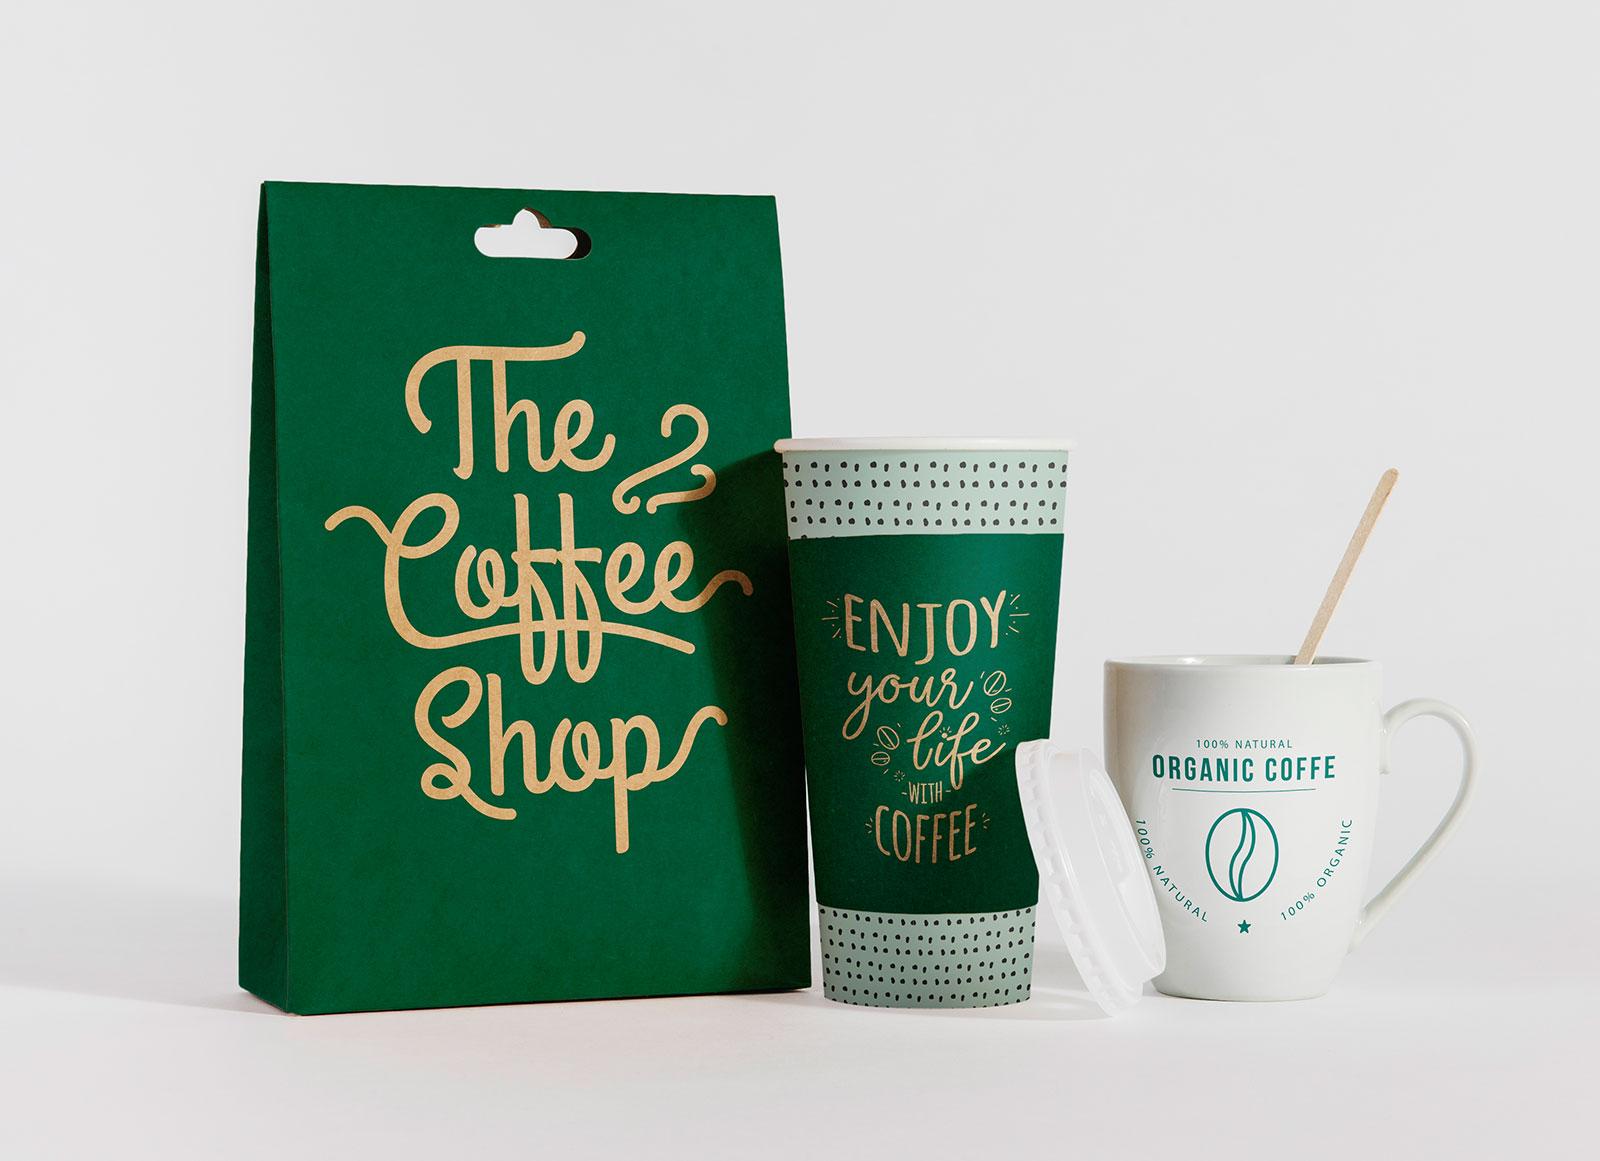 Free-Take-Away-Coffee-Cup-&-Burger-Packaging-Mockup-PSD